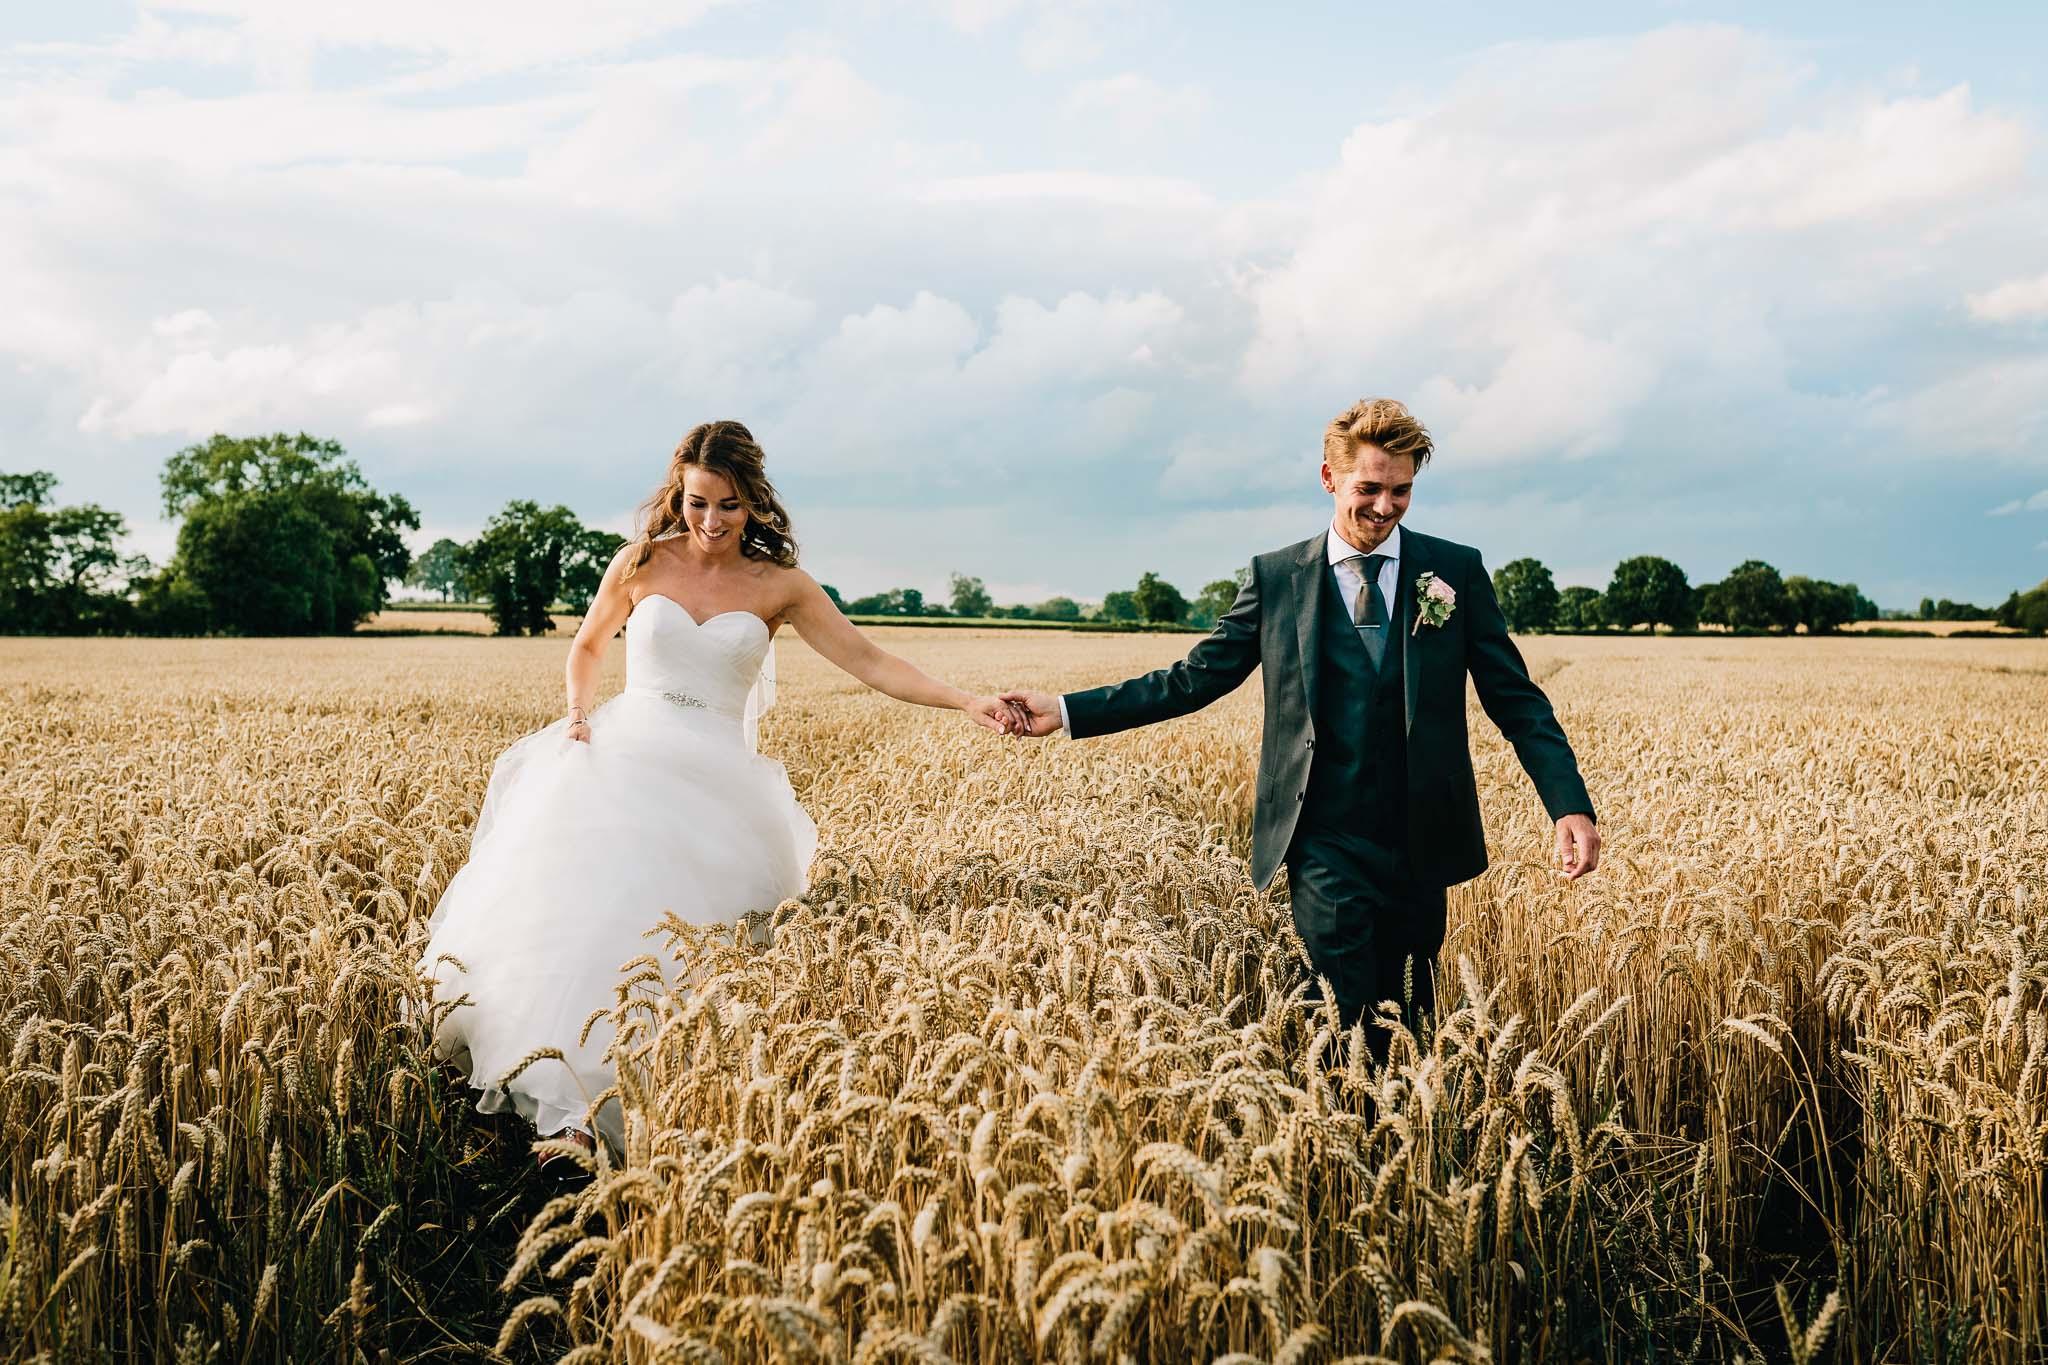 MYTHE WEDDING BARN WEDDING PHOTOGRAPHER JAMES ANDREW PHOTOGRAPHY